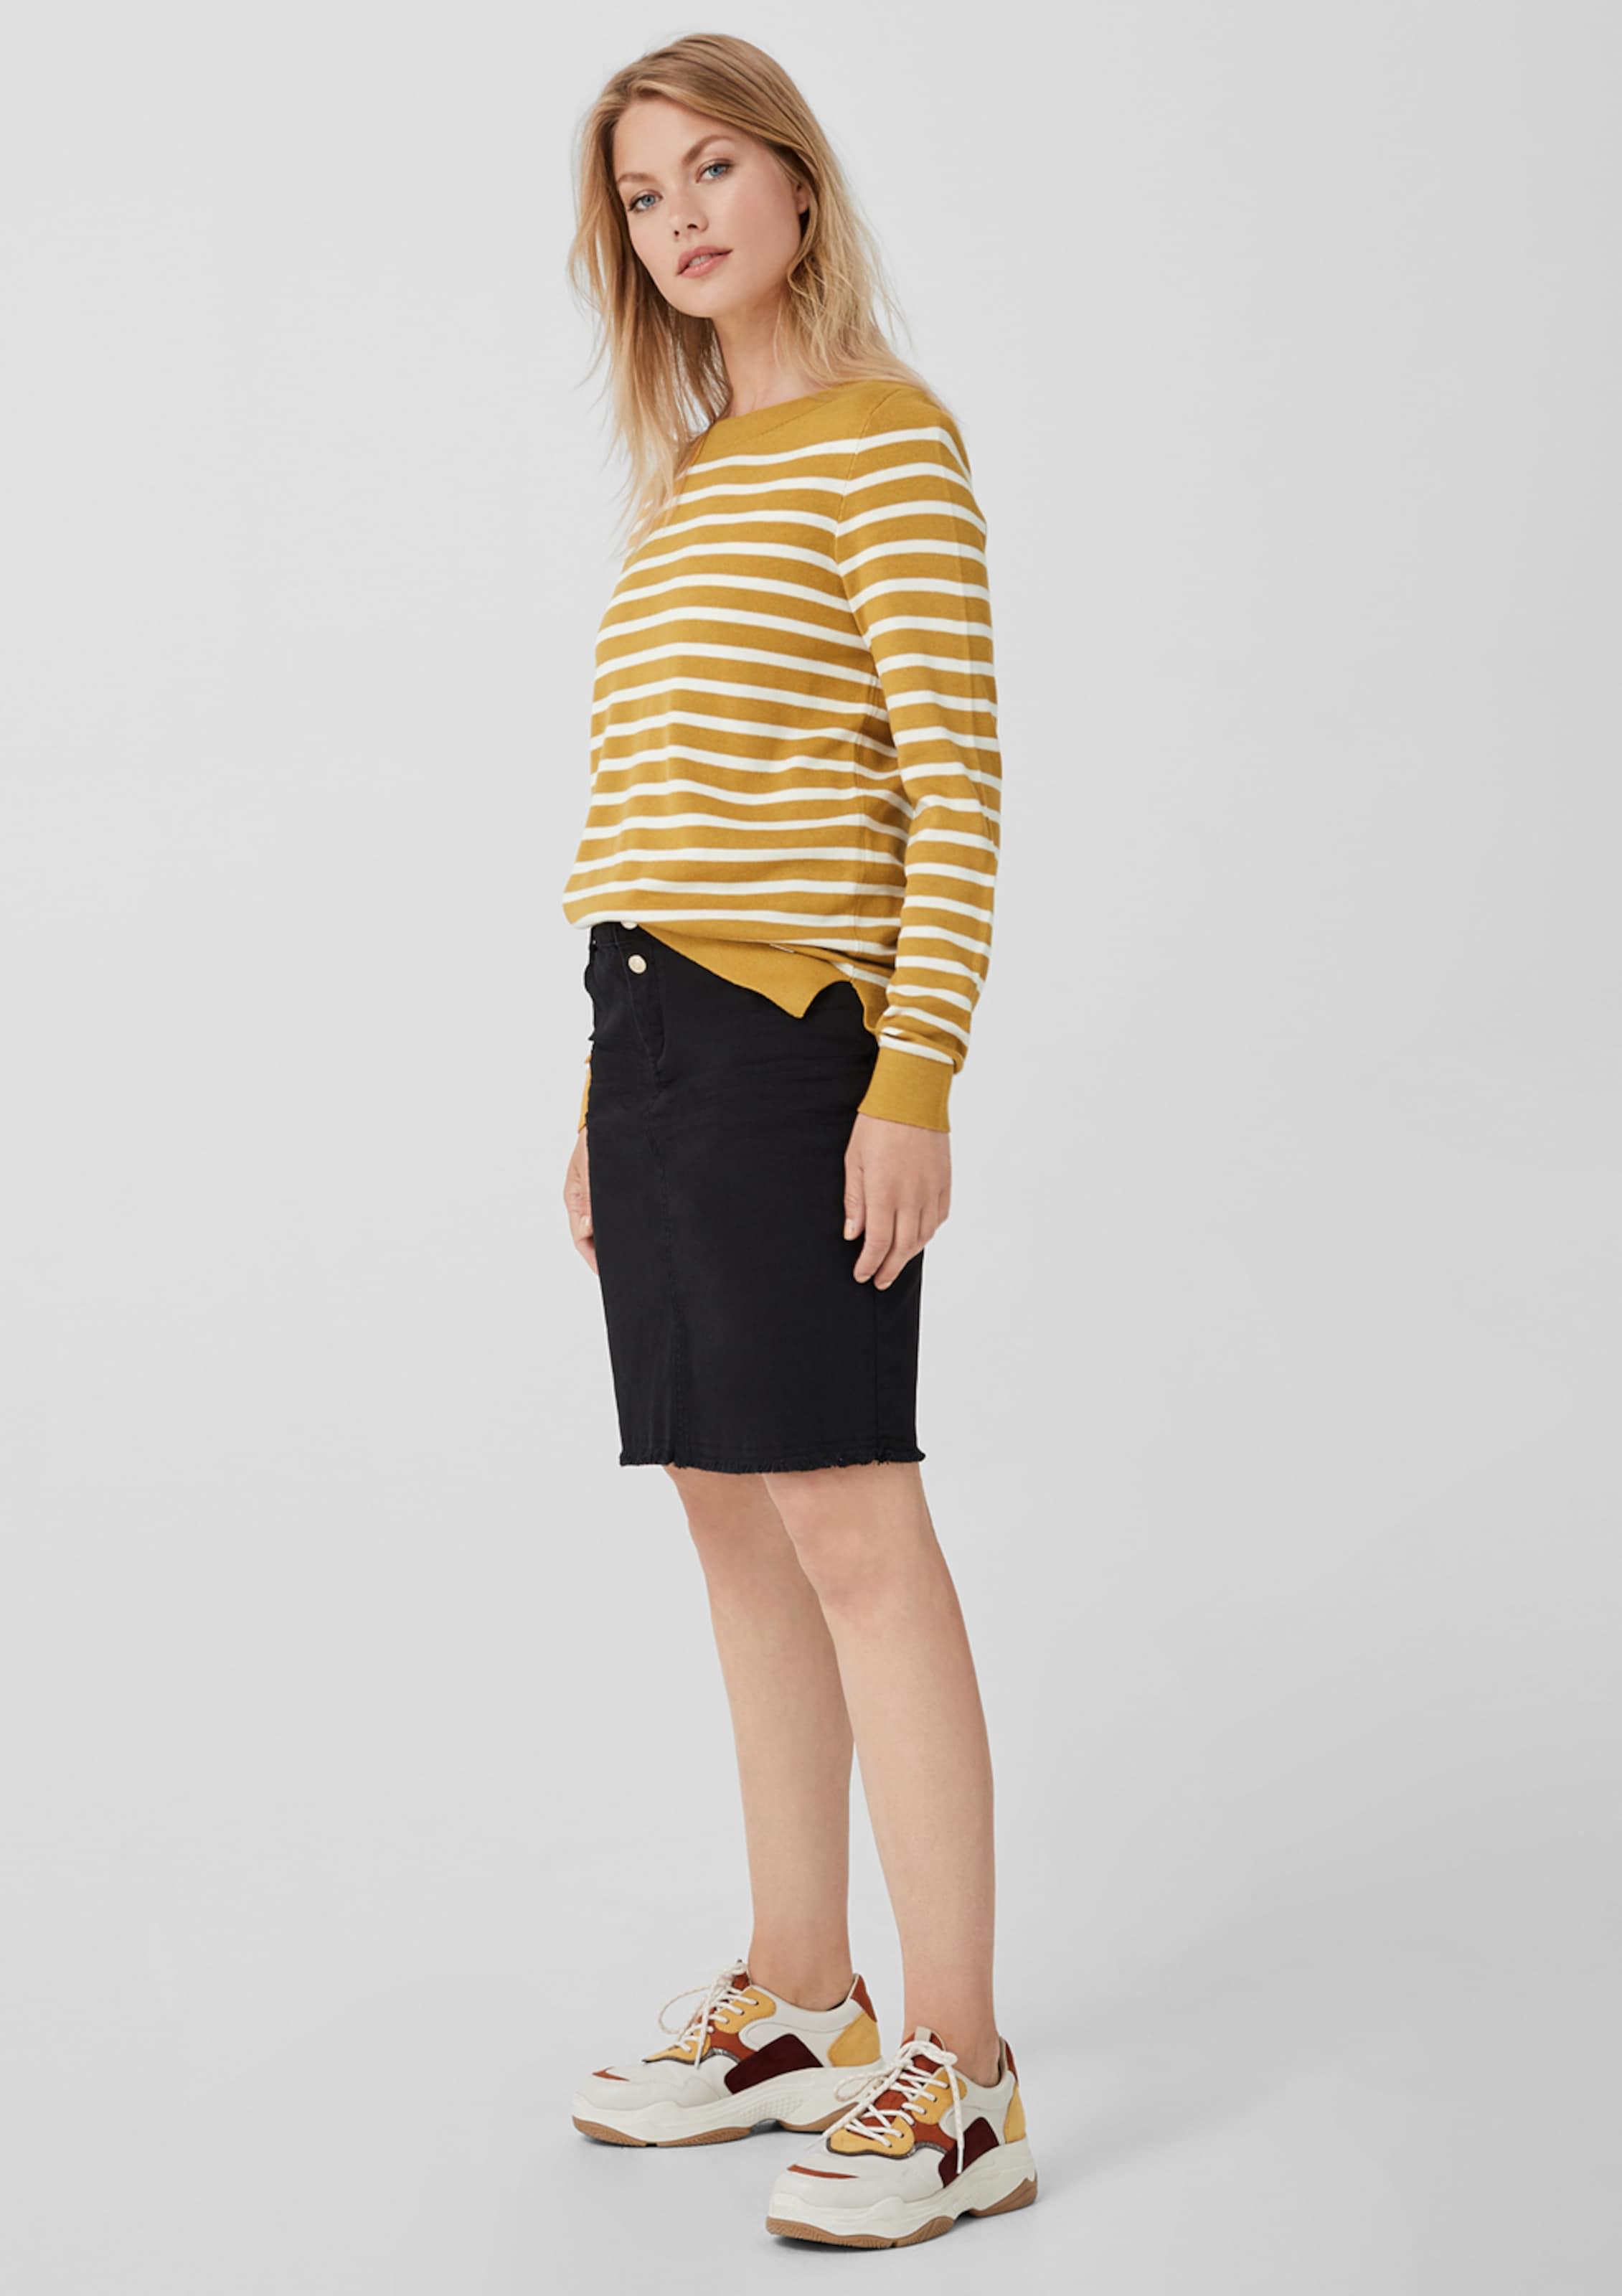 oliver S In Pullover oliver GelbWeiß S Pullover k8wnX0OP